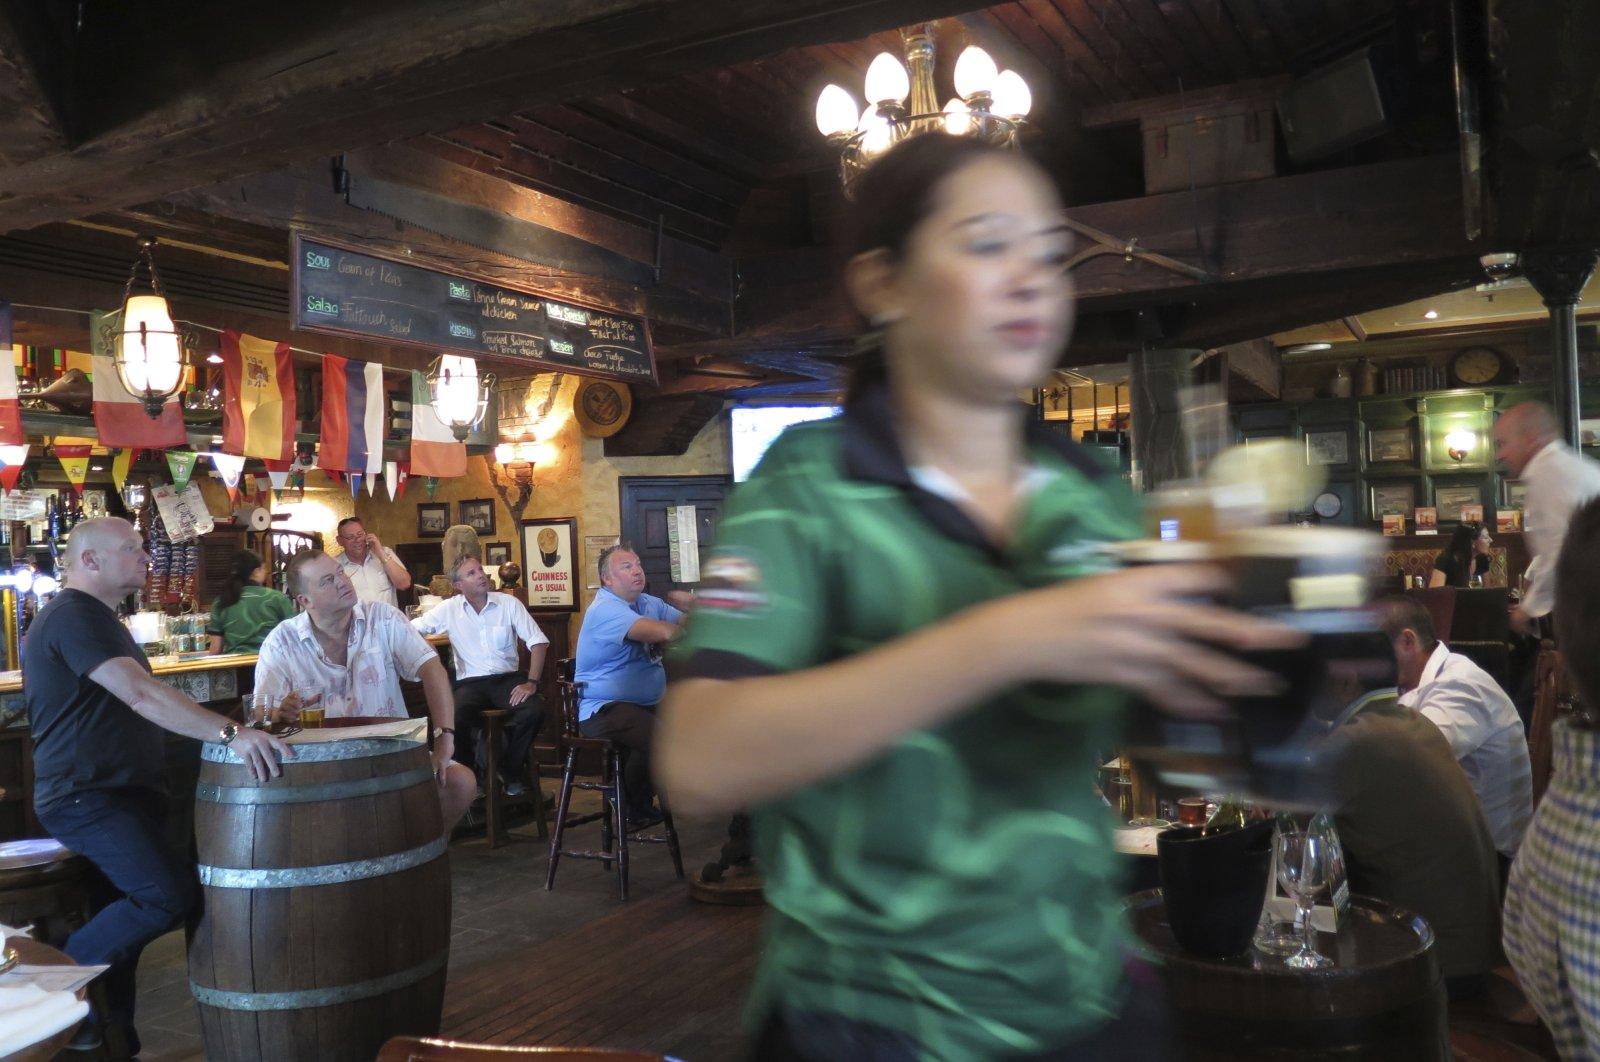 A waitress serves customers beer at a restaurant in Dubai, United Arab Emirates, June 22, 2016 . (AP Photo)